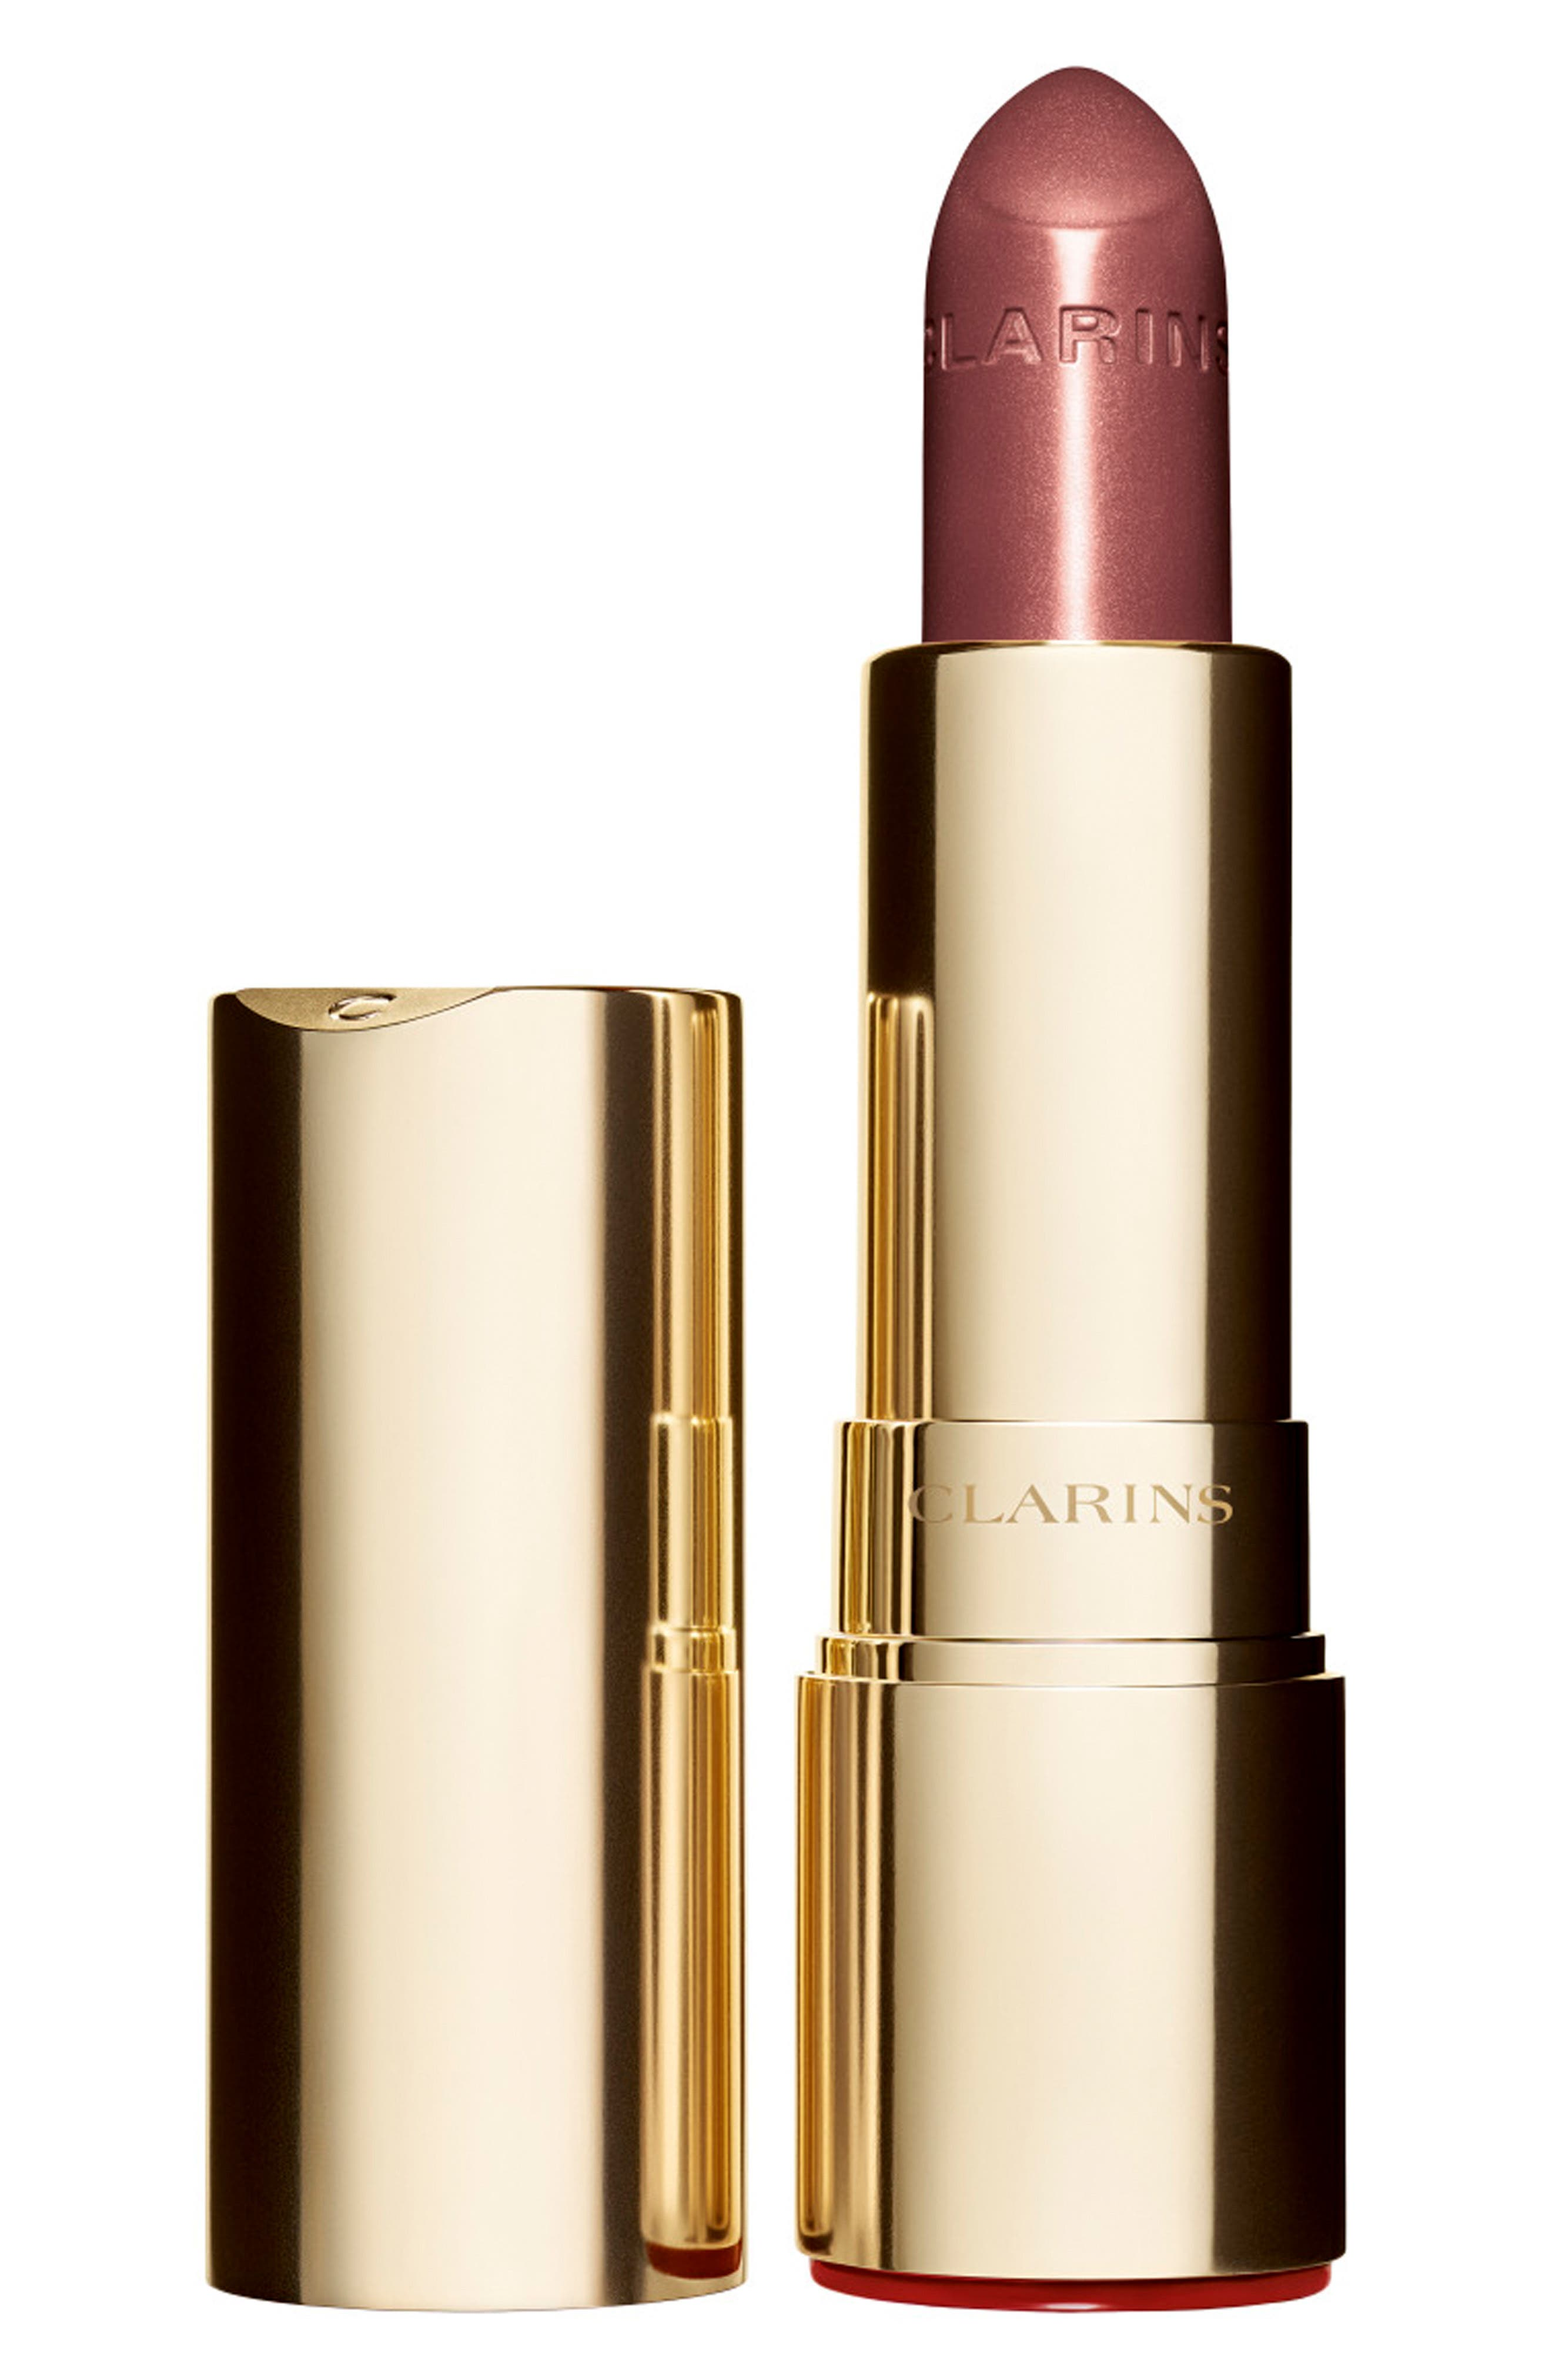 Joli Rouge Brilliant Sheer Lipstick,                             Main thumbnail 1, color,                             757 NUDE BRICK